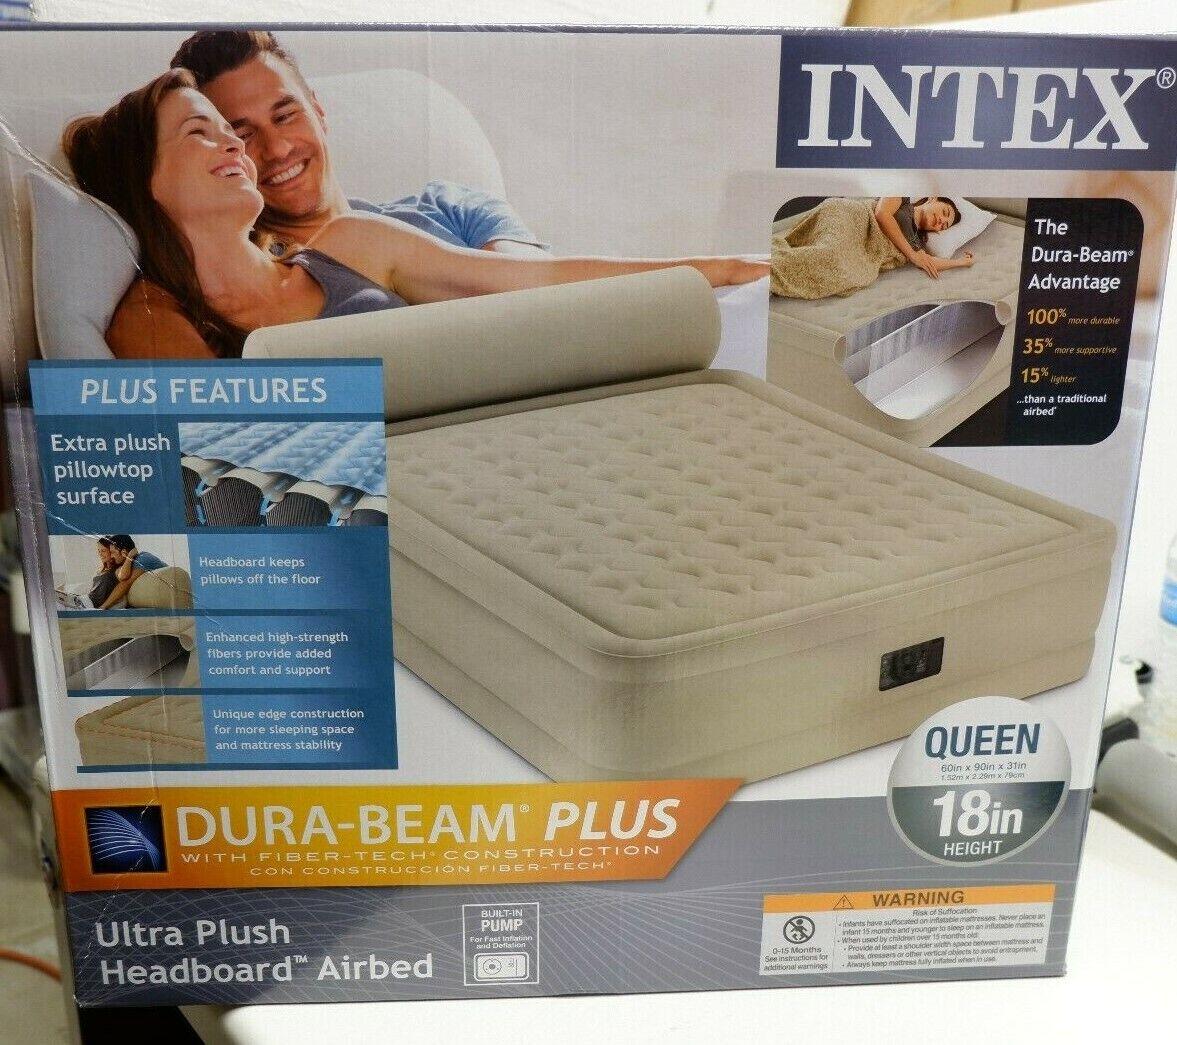 Intex Queen Raised Headboard Air Bed Mattress Airbed Built i